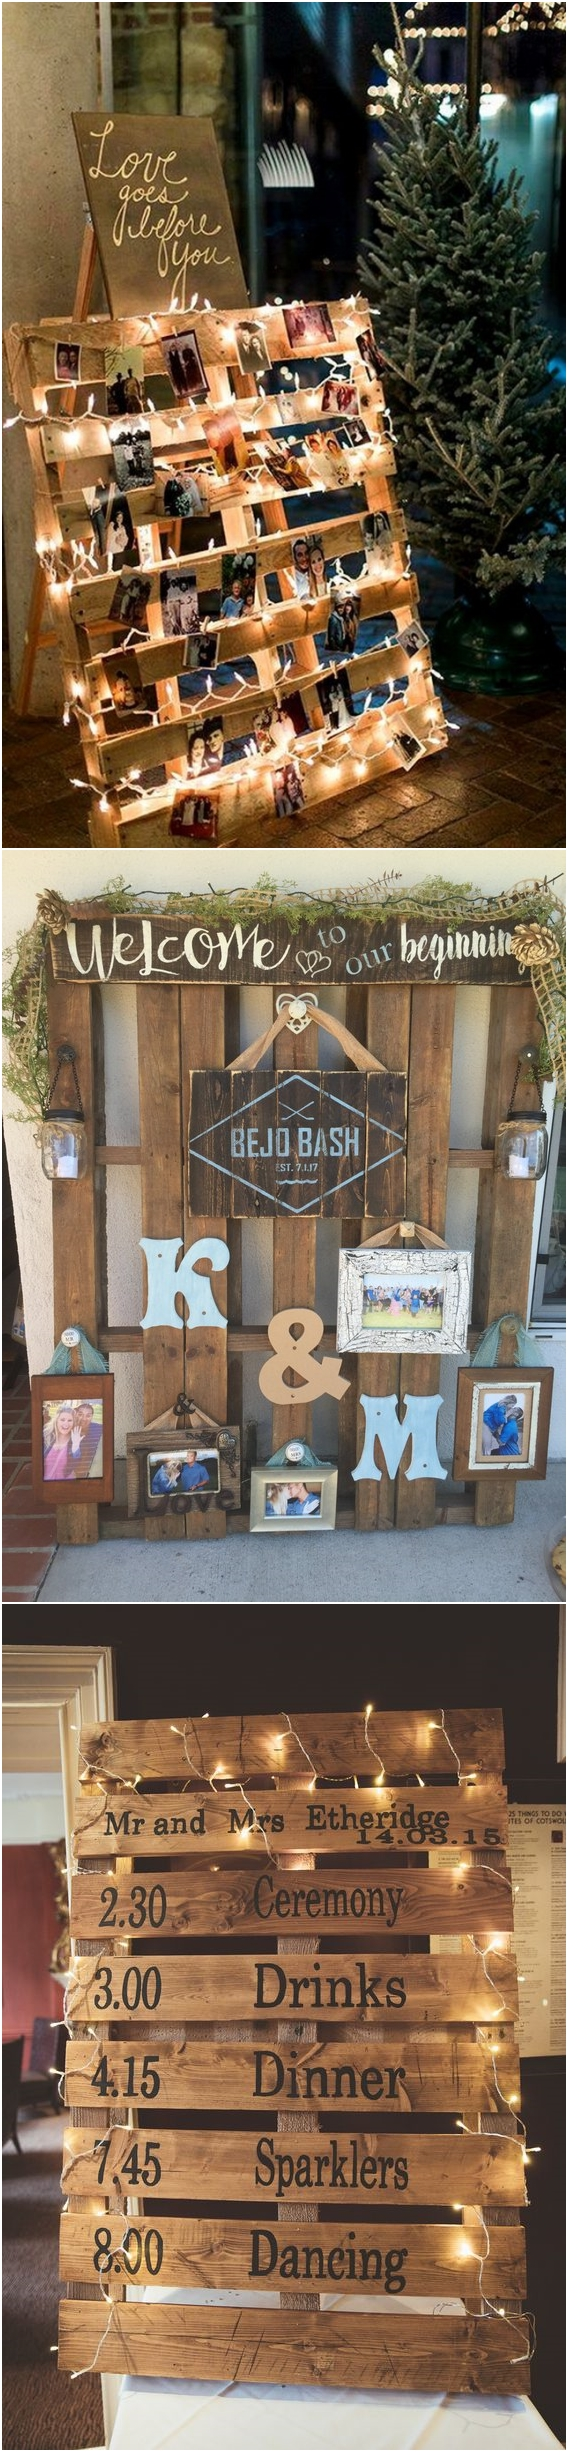 Pallet wedding decor ideas  Top  Rustic Country Wooden Pallet Wedding Ideas  rustico